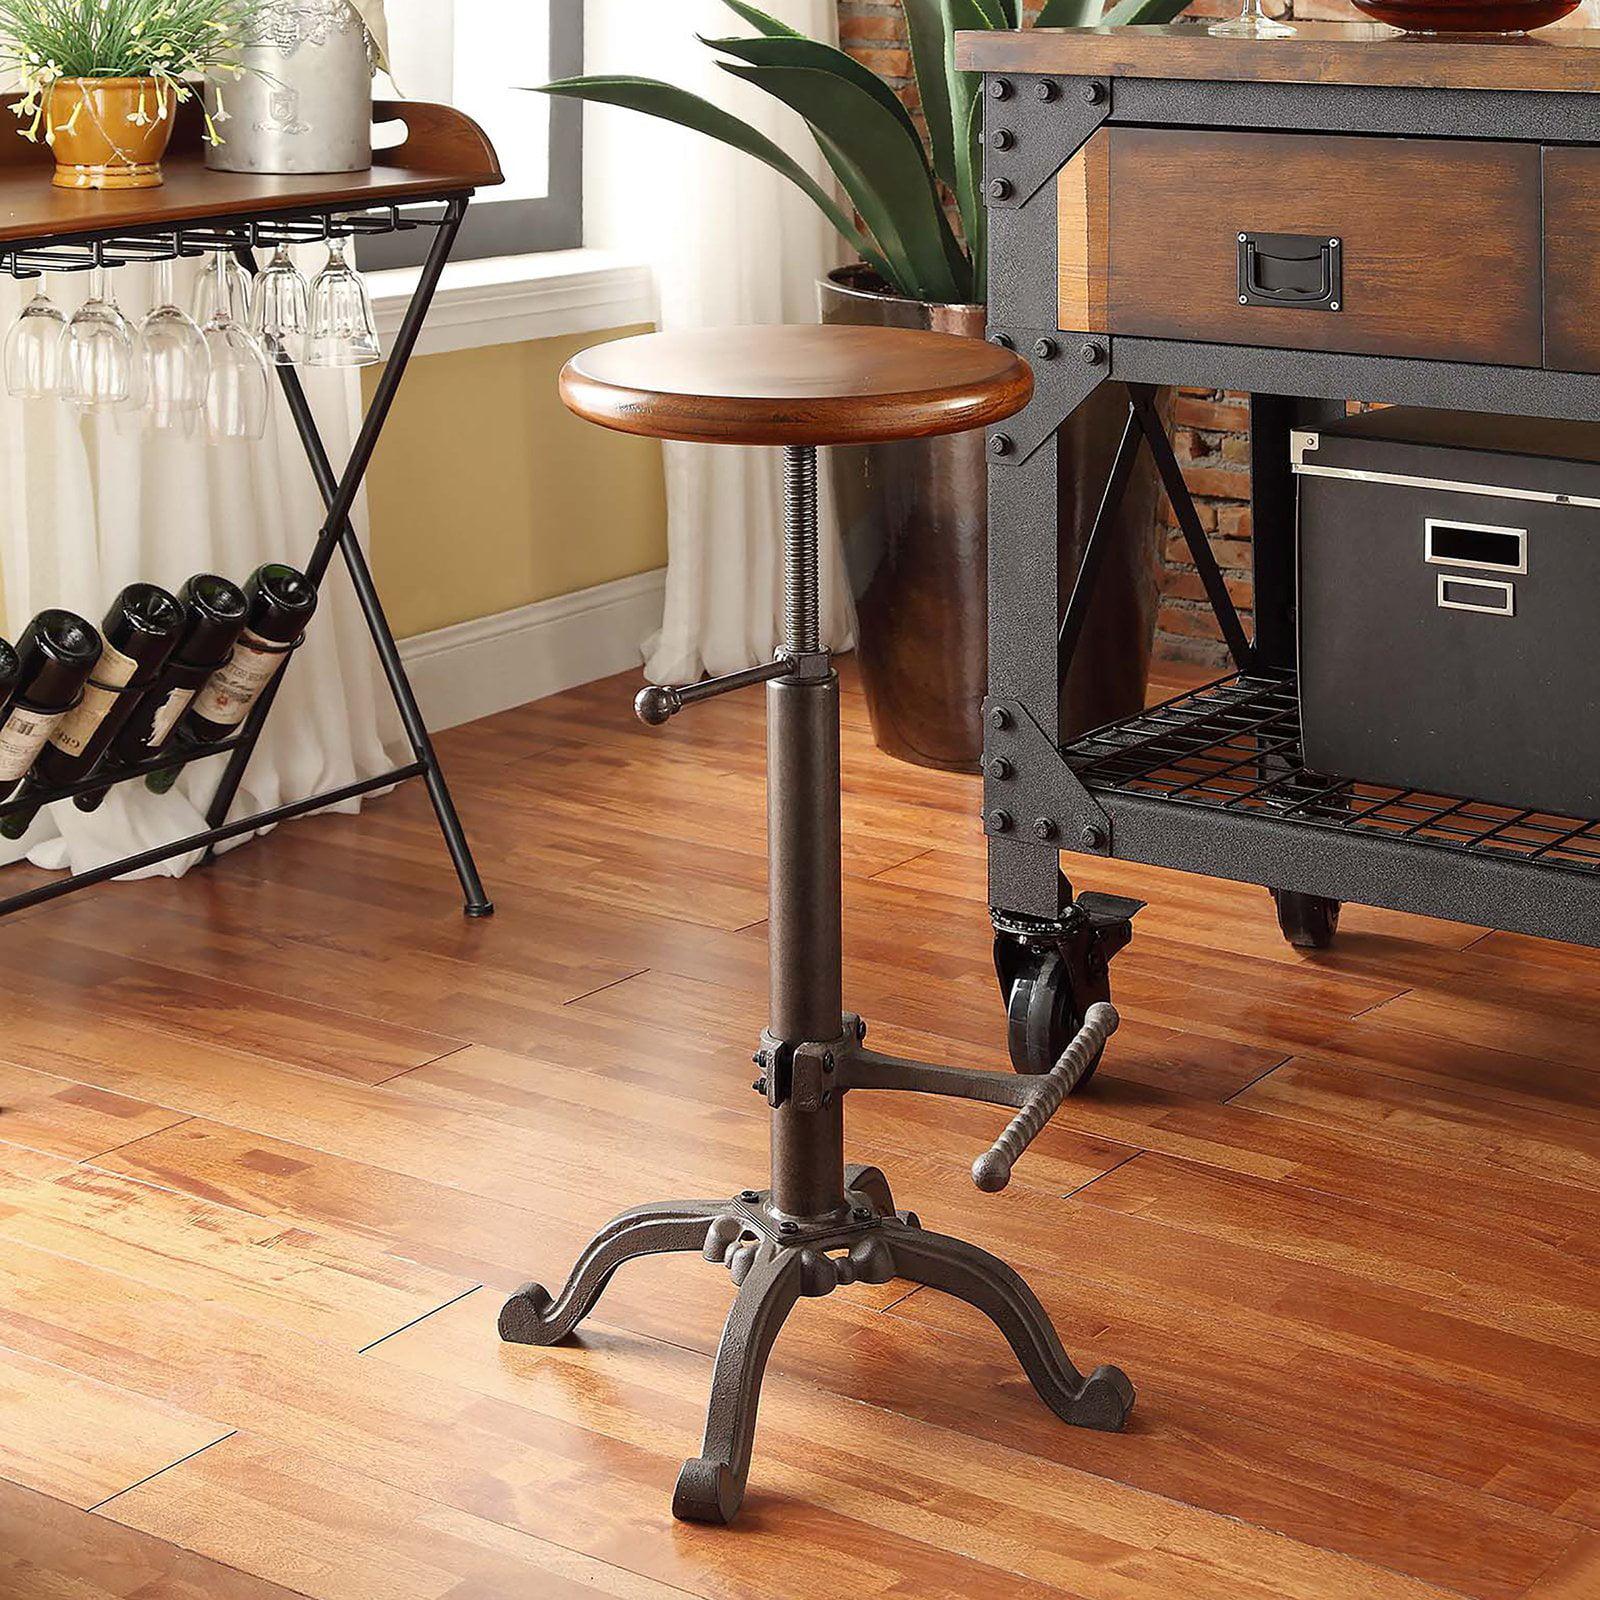 Peachy Carolina Chair And Table Houston Adjustable Swivel Stool Beatyapartments Chair Design Images Beatyapartmentscom